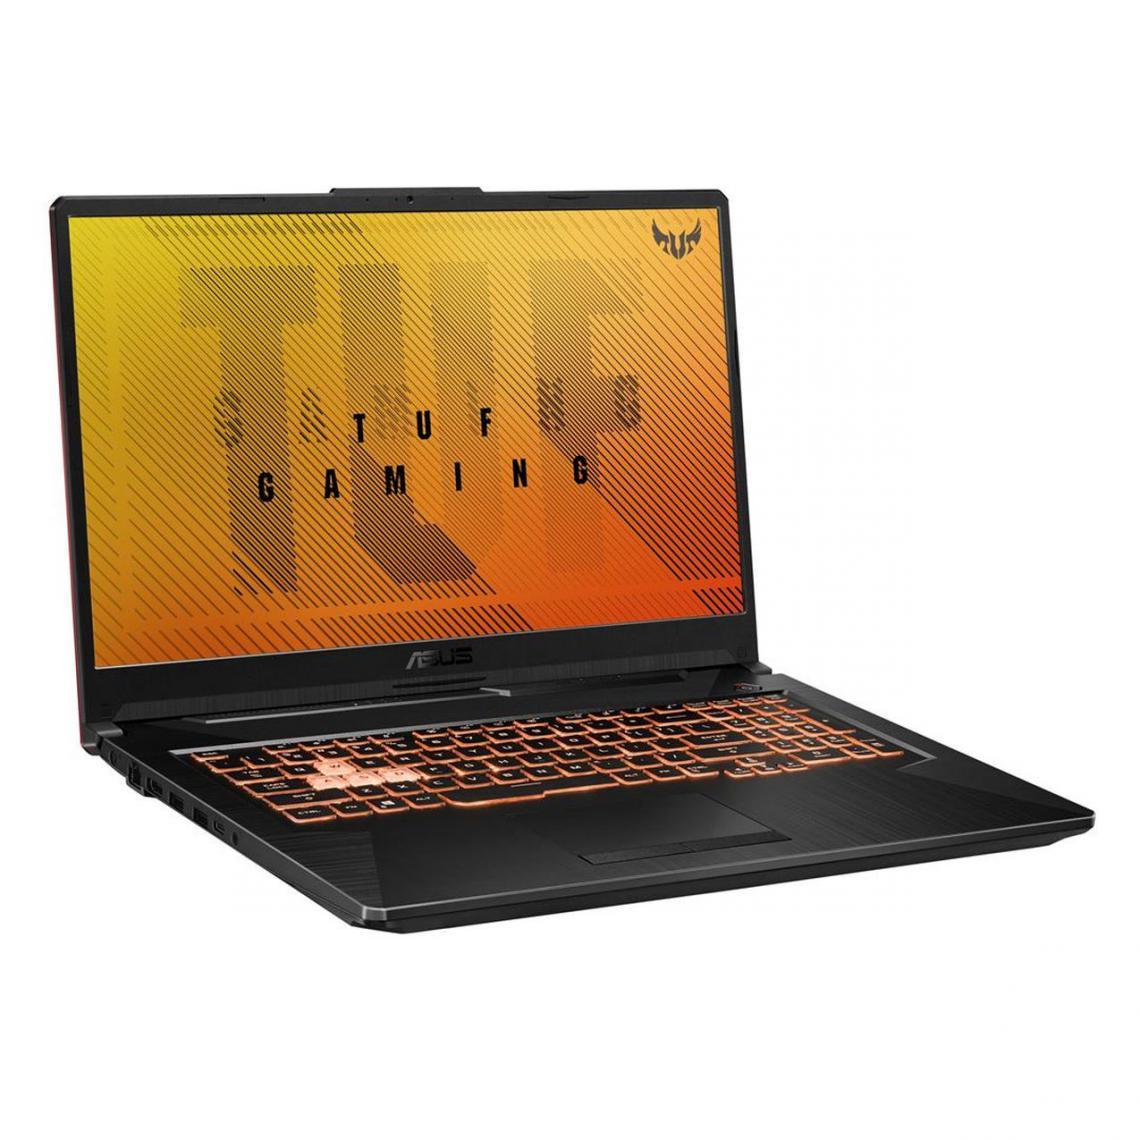 Asus PC Portable Gamer ASUS TUF F17 TUF706LI H7163 - 17,3 FHD